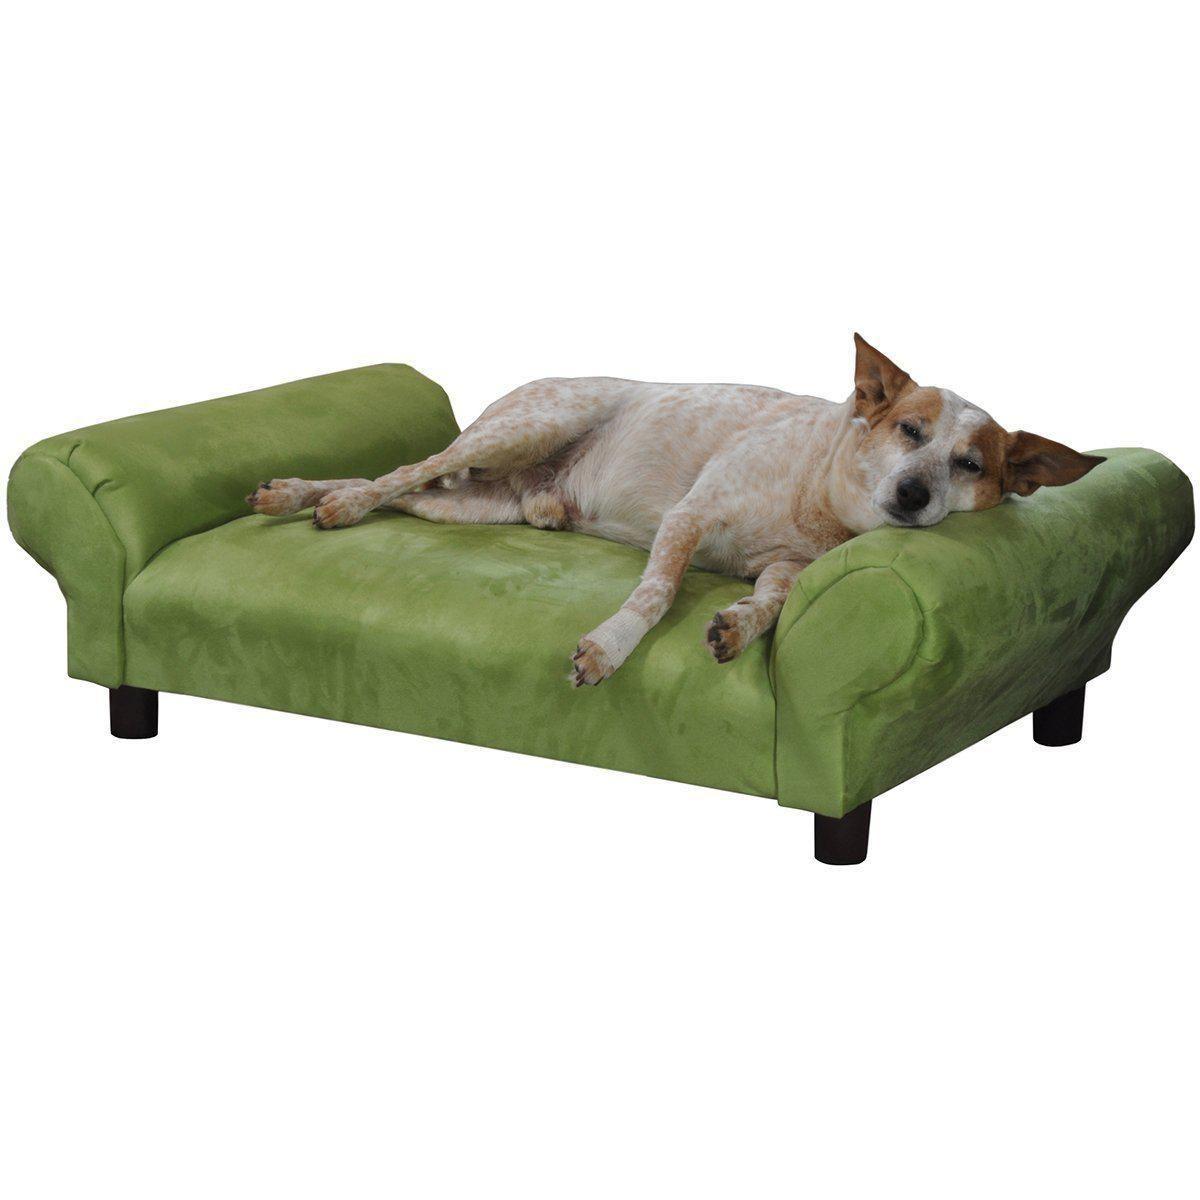 Isadora Dog Day Bed